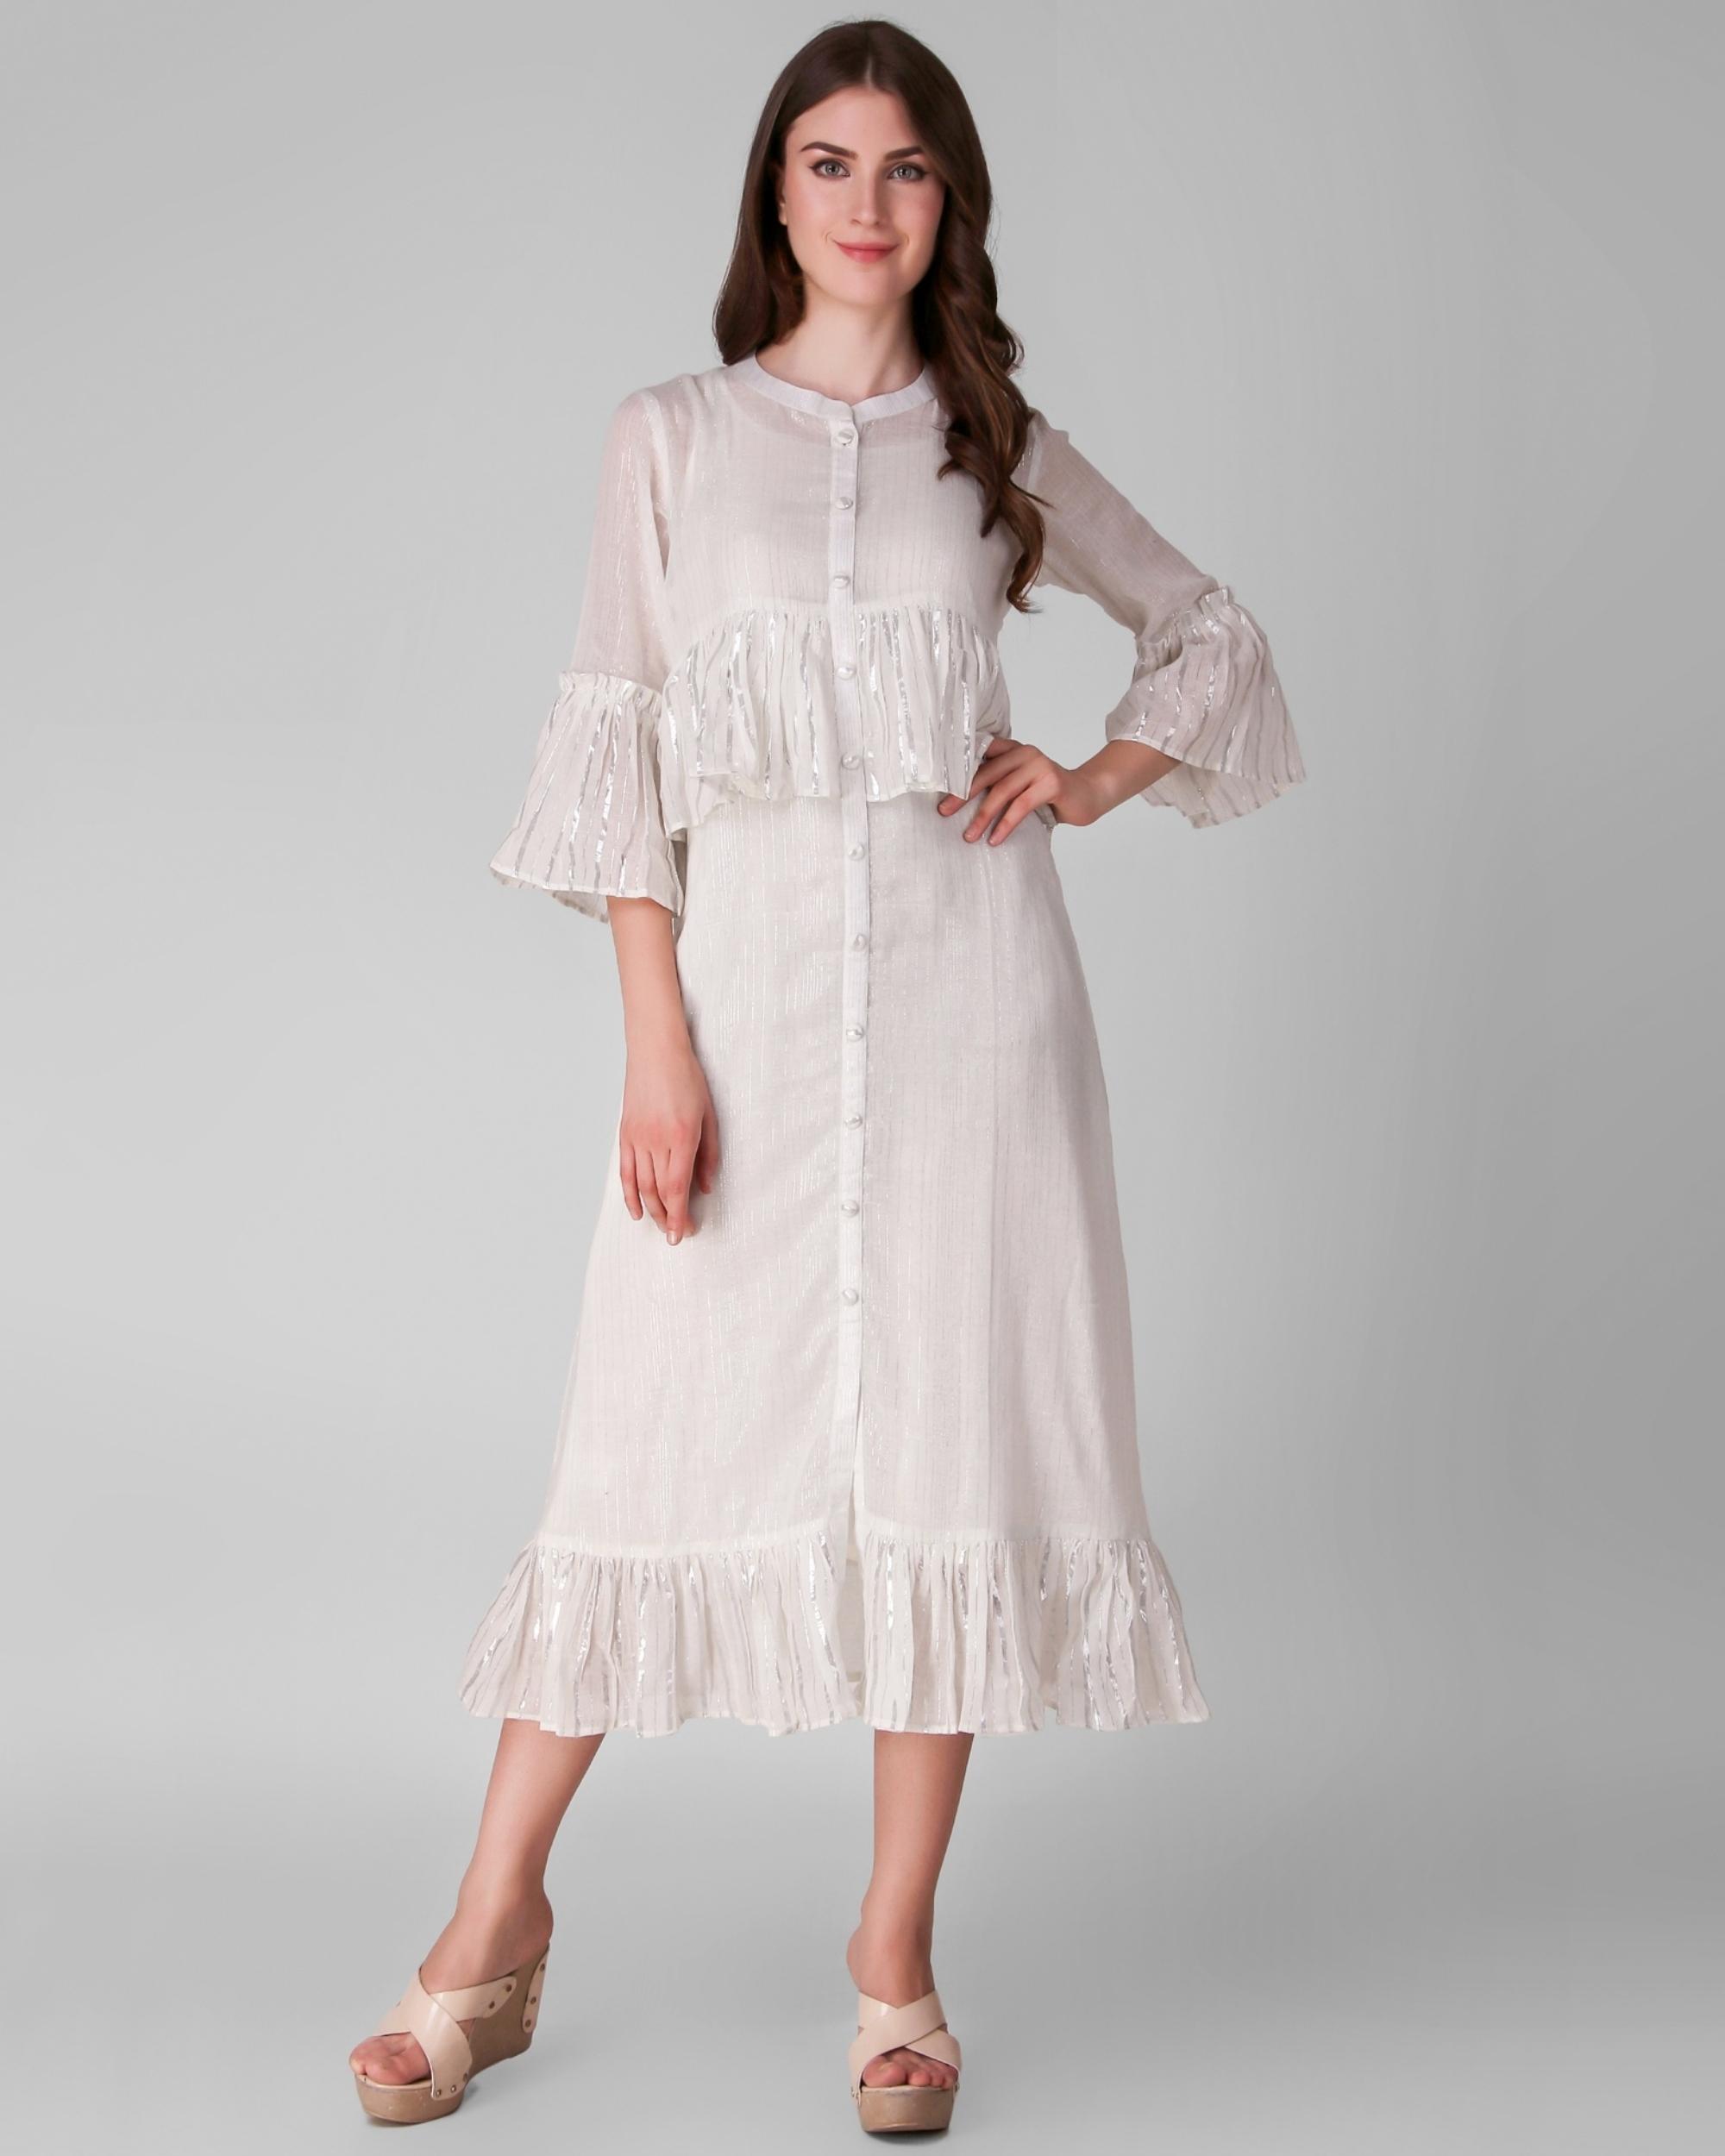 Ivory cotton lurex frill dress - set of two